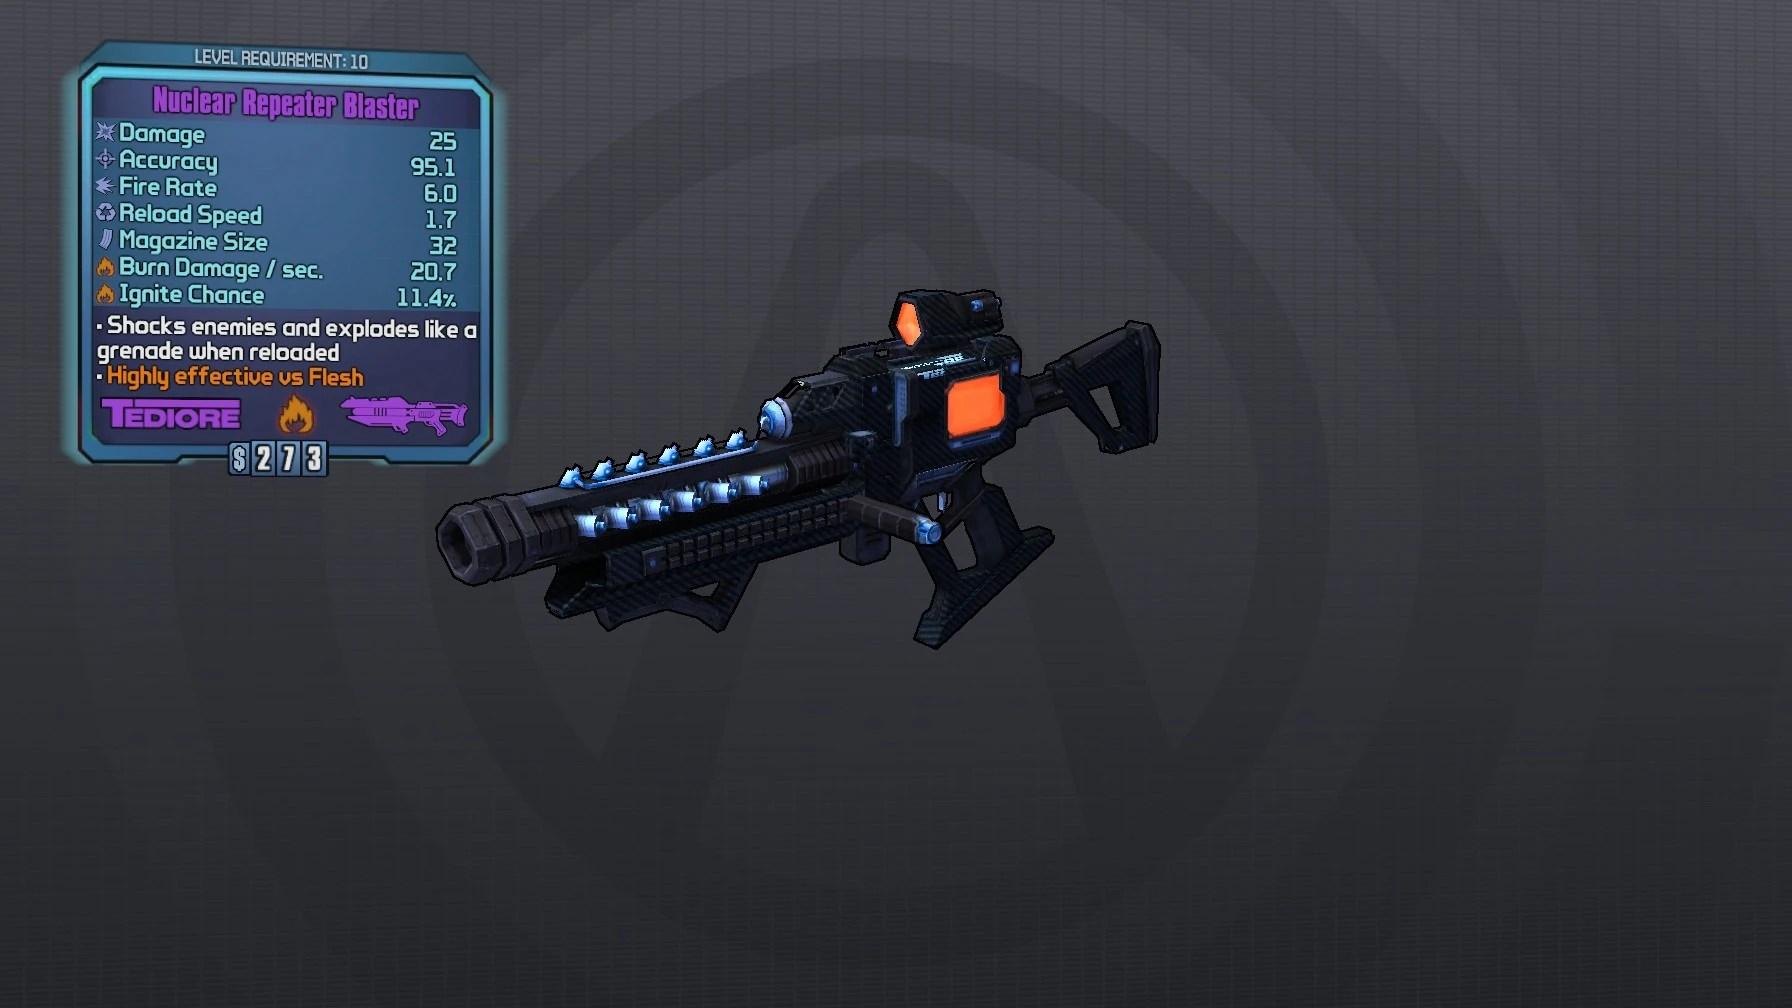 Blaster Laser Borderlands Wiki Walkthroughs Weapons Classes Character Builds Enemies